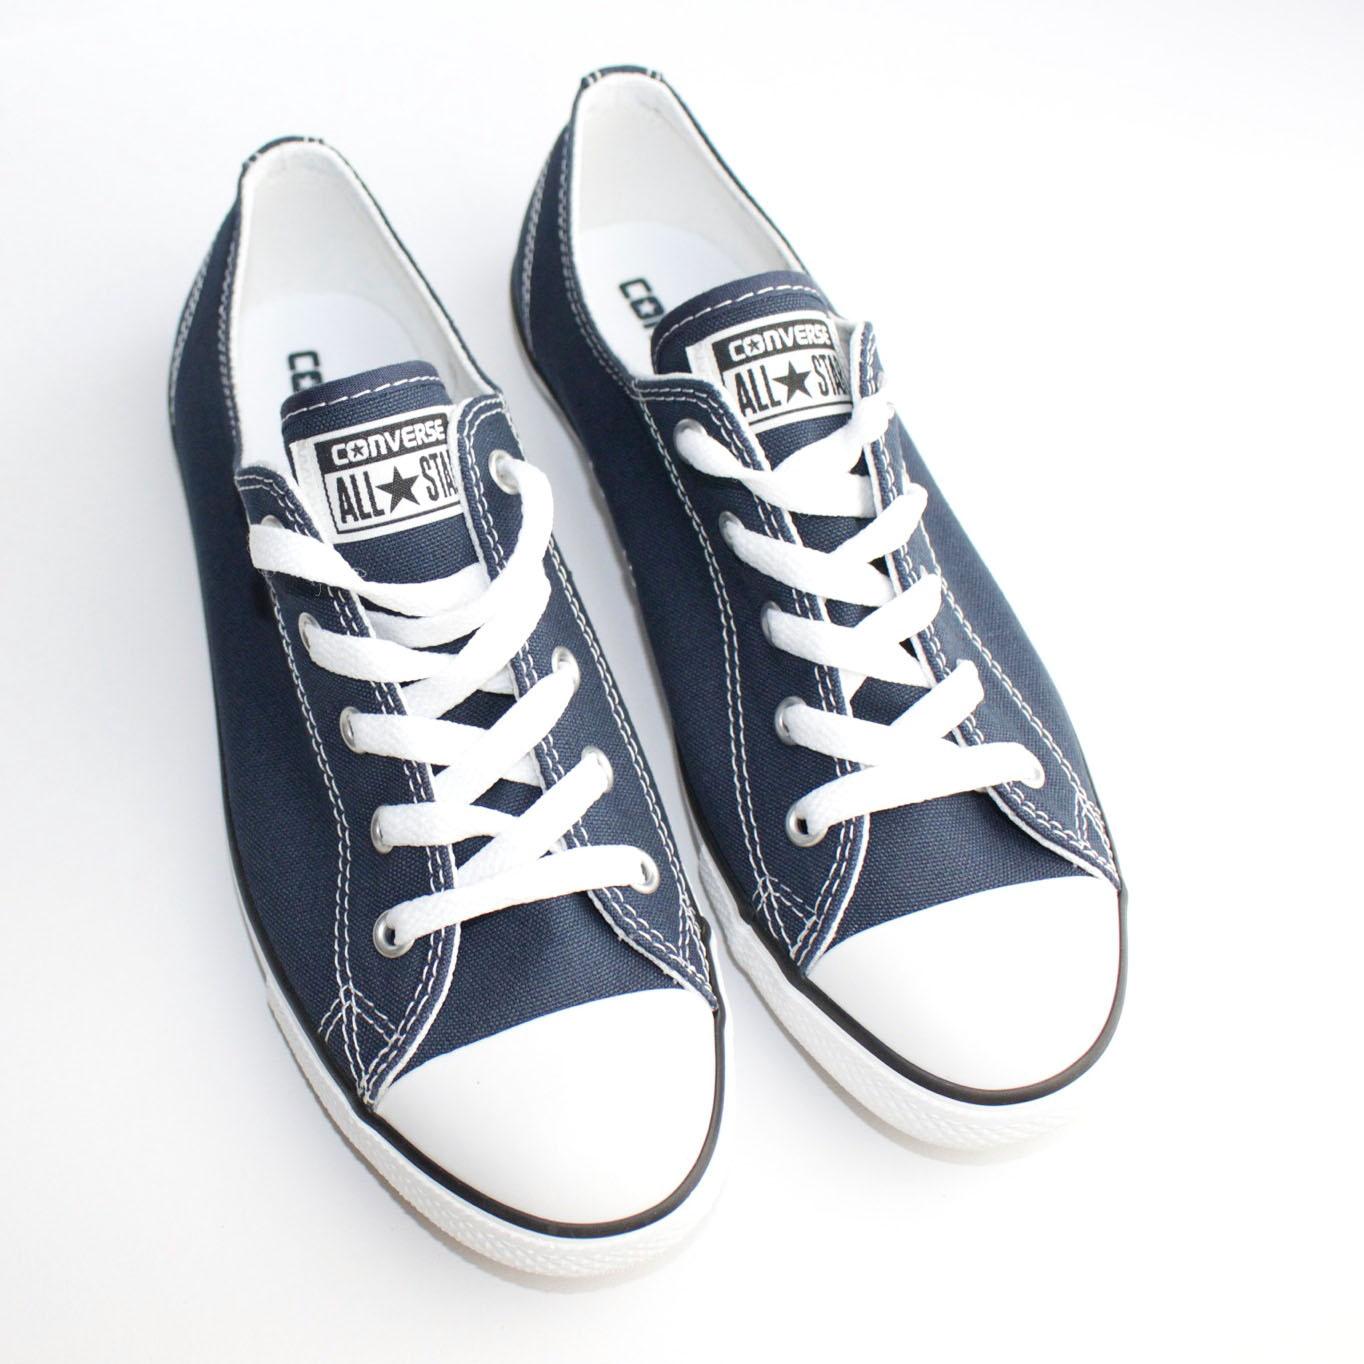 Shoppinator-Shoppitipp-Converse-Chucks-Dainty-Dunkelblau-Marine